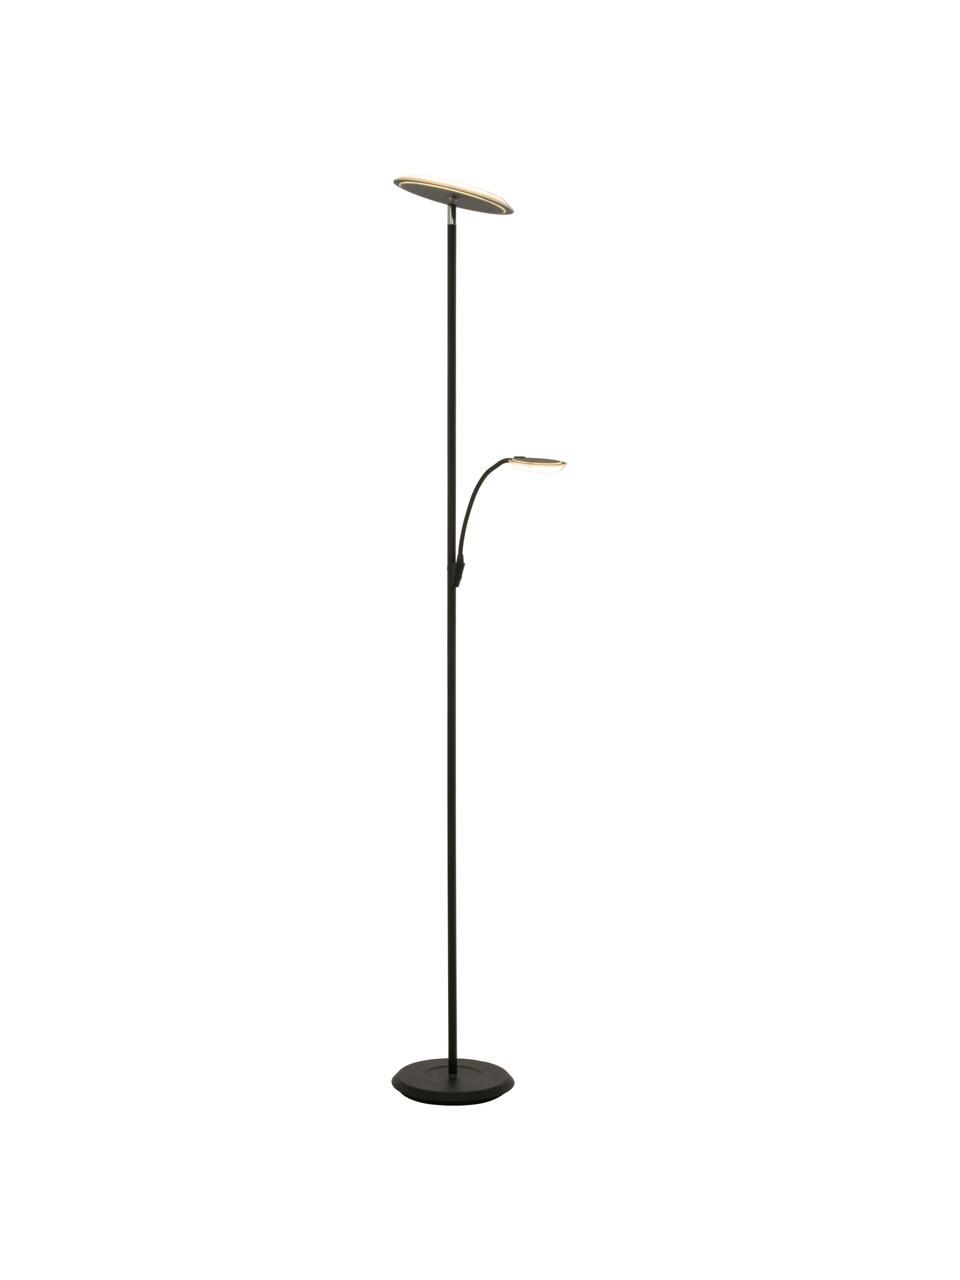 Grote dimbare LED vloerlamp Stockholm met leeslamp, Lampenkap: acryl, Lampvoet: gecoat metaal, Zwart, 50 x 184 cm